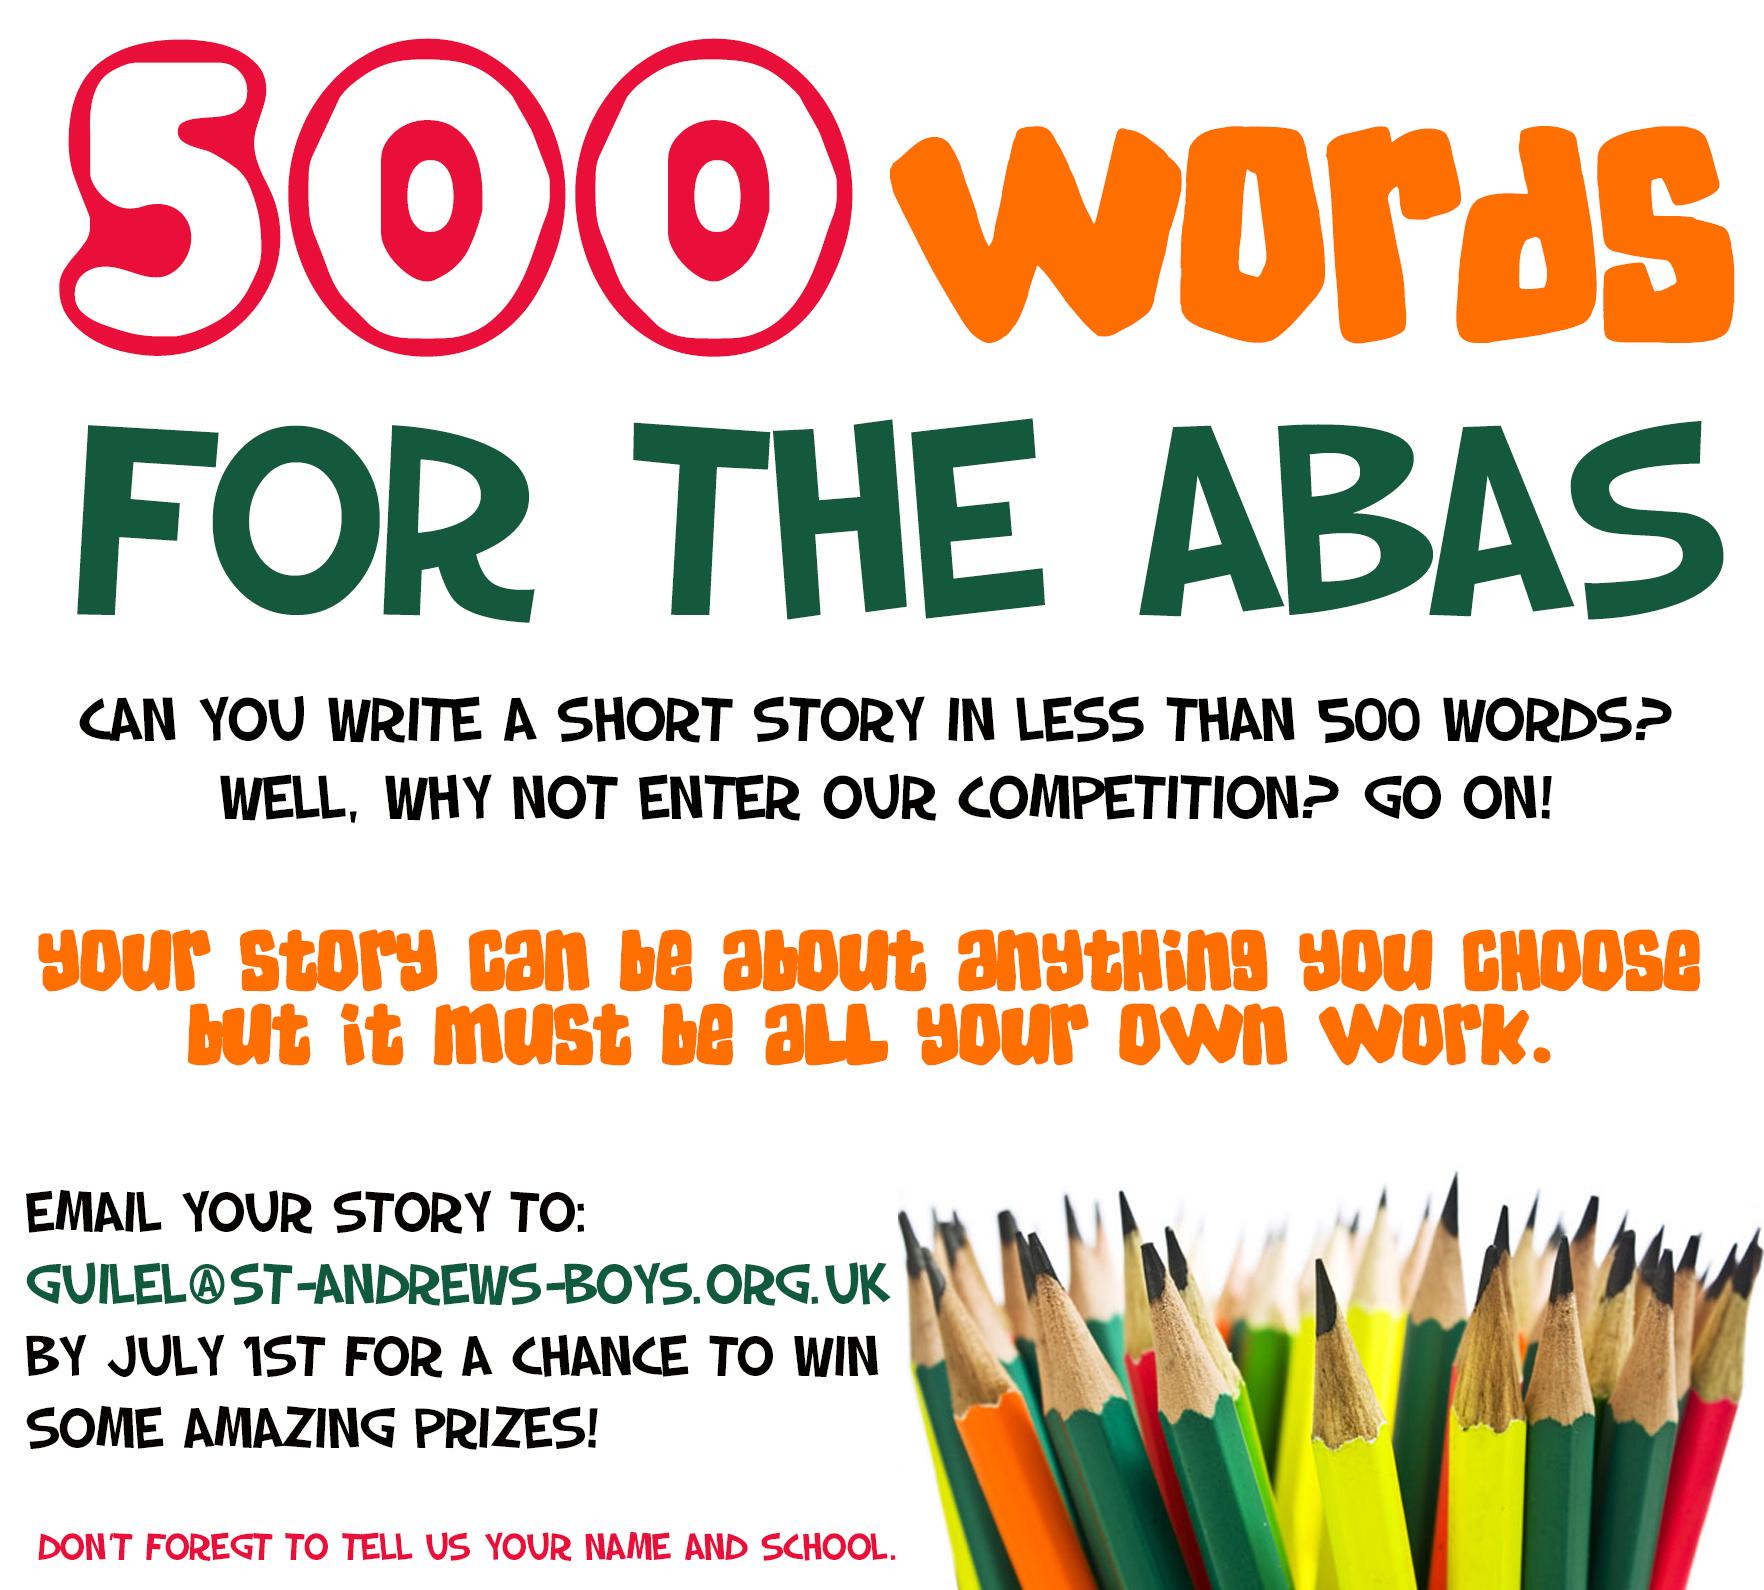 Essay format 500 words bbc